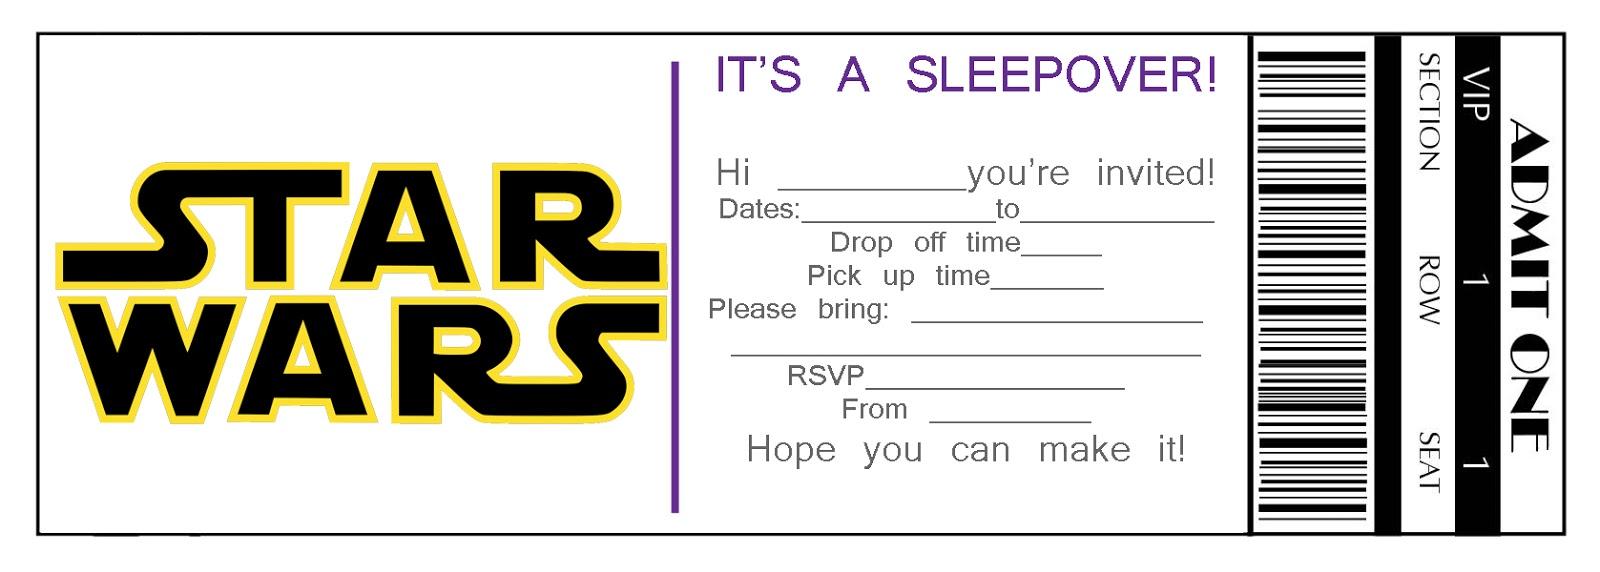 sleepover template invitations free - Paso.evolist.co